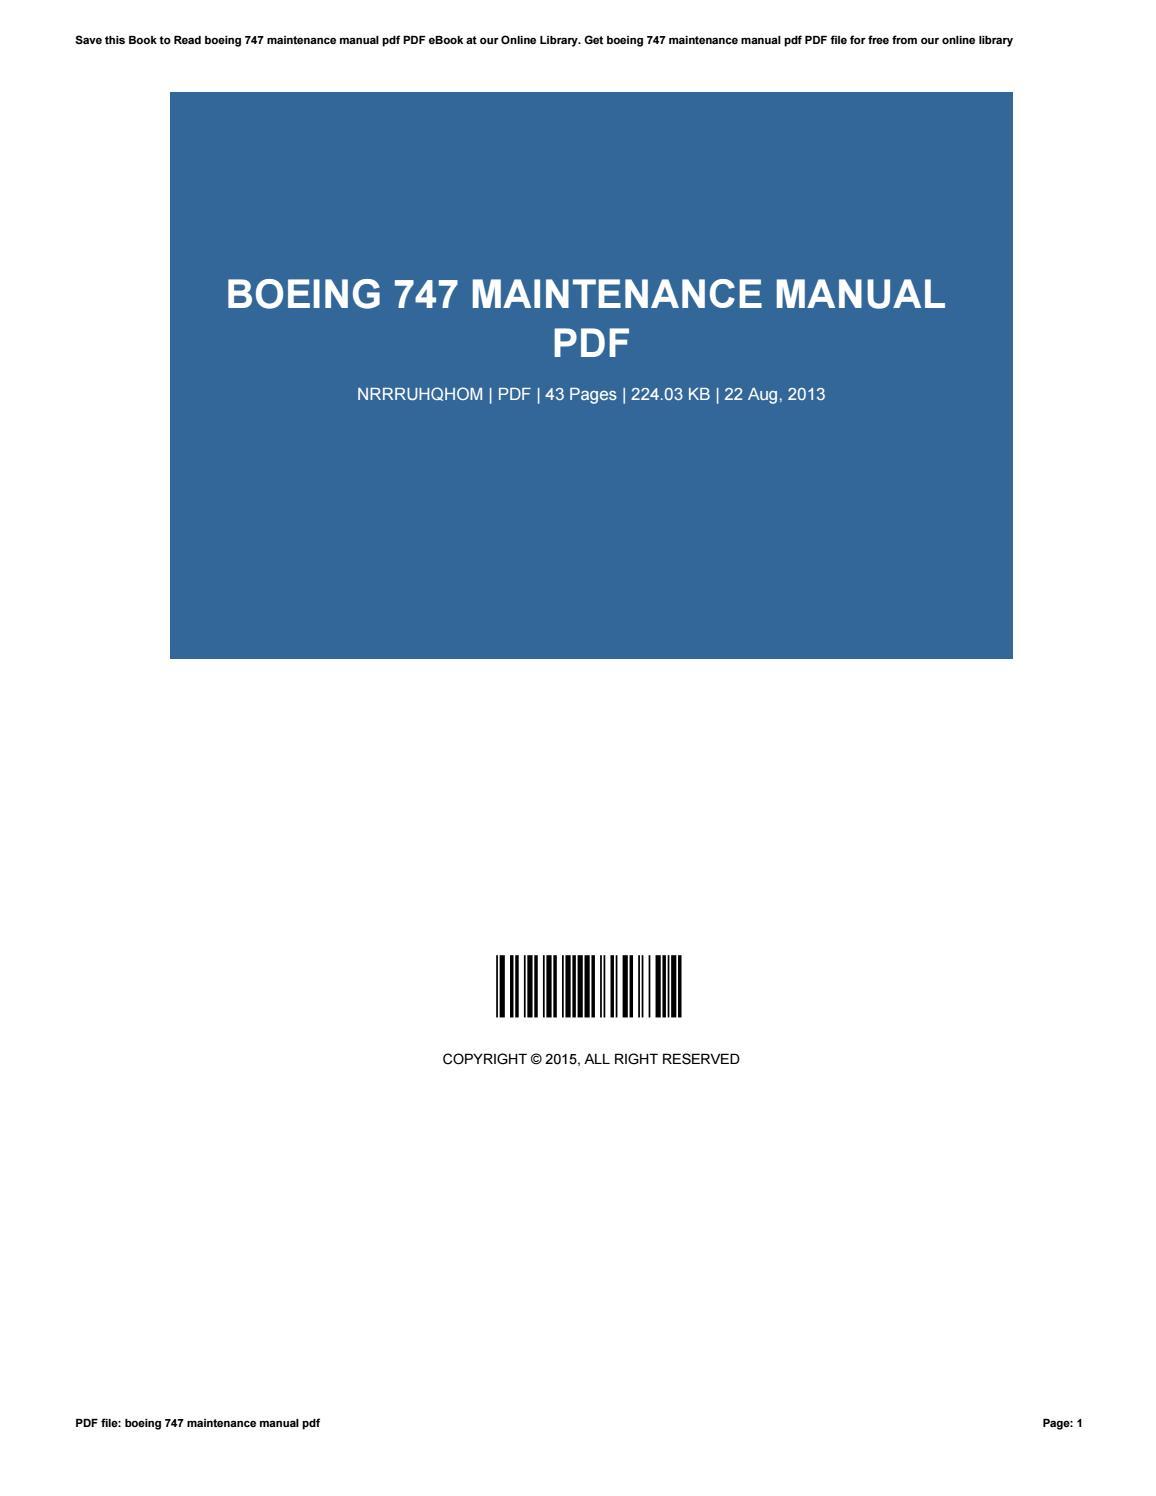 boeing 747 maintenance manual pdf by kathleencooley4368 issuu rh issuu com Boeing 797 aircraft maintenance manual boeing 747